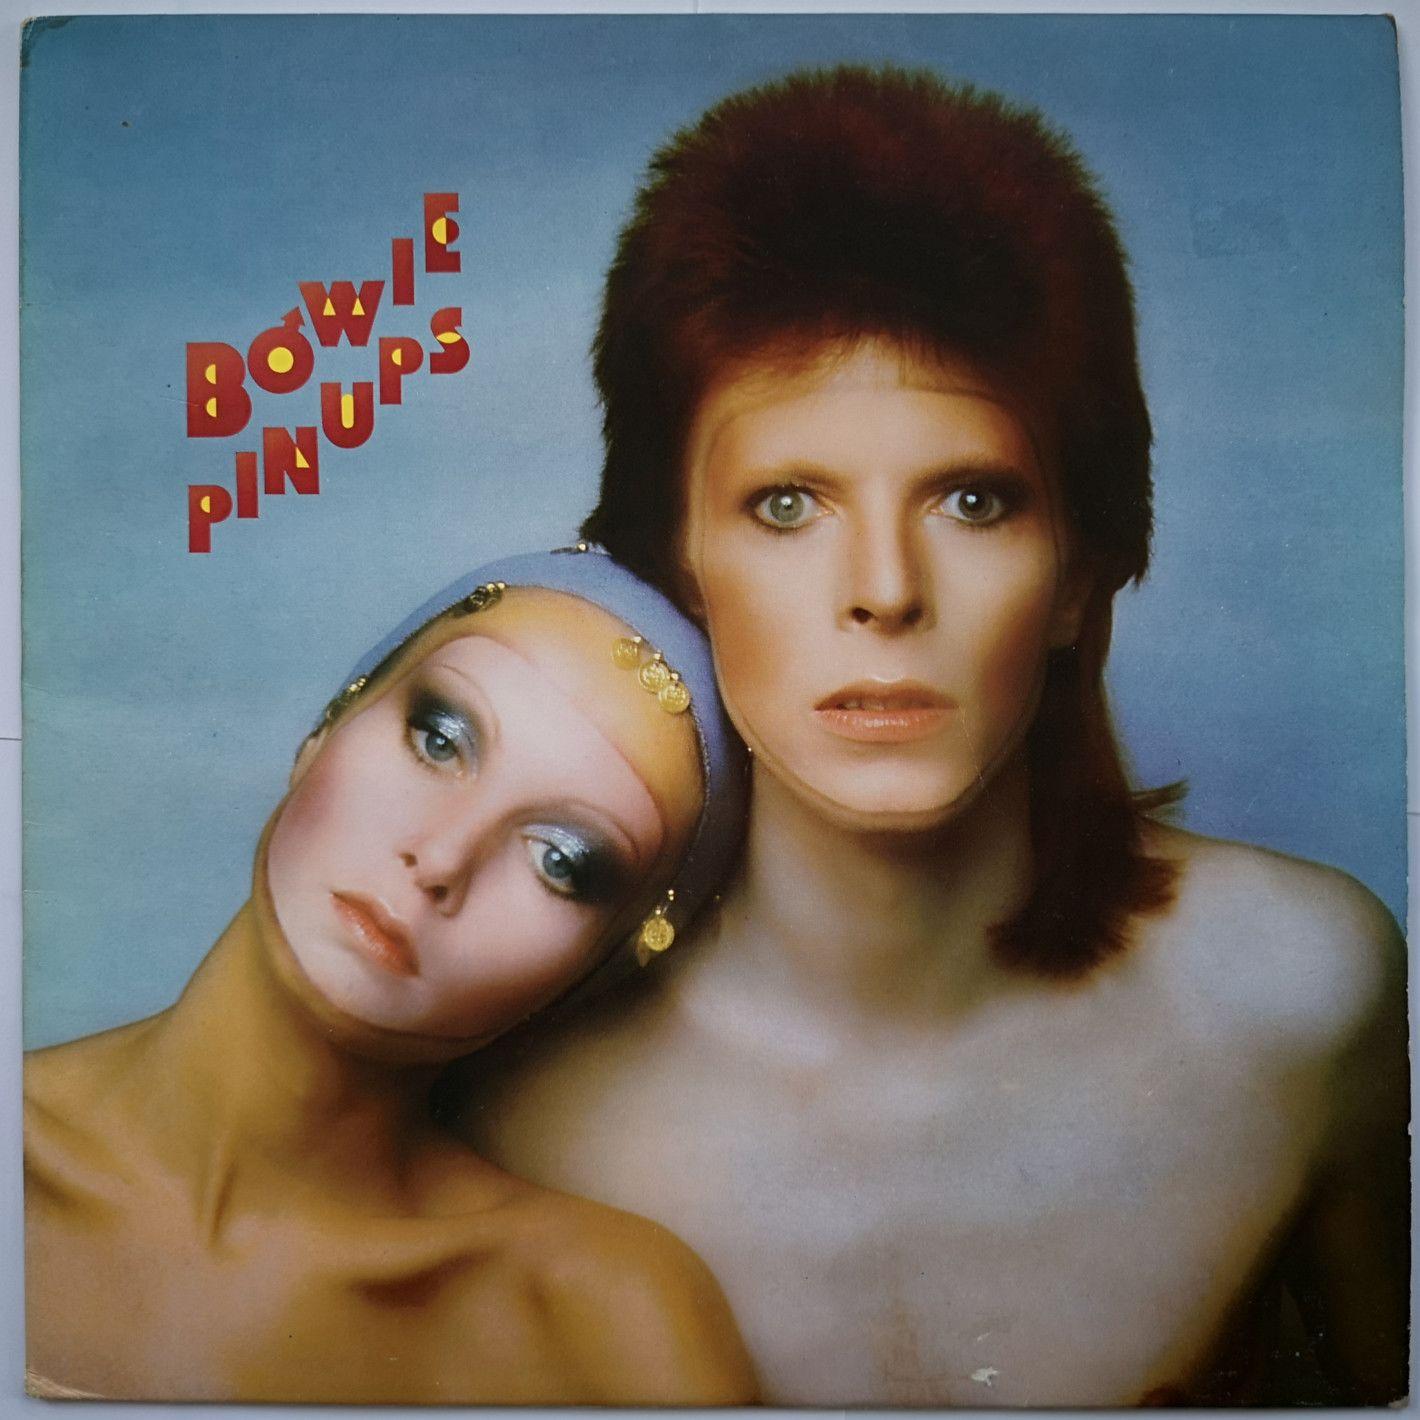 David Bowie Pinups LP undefined